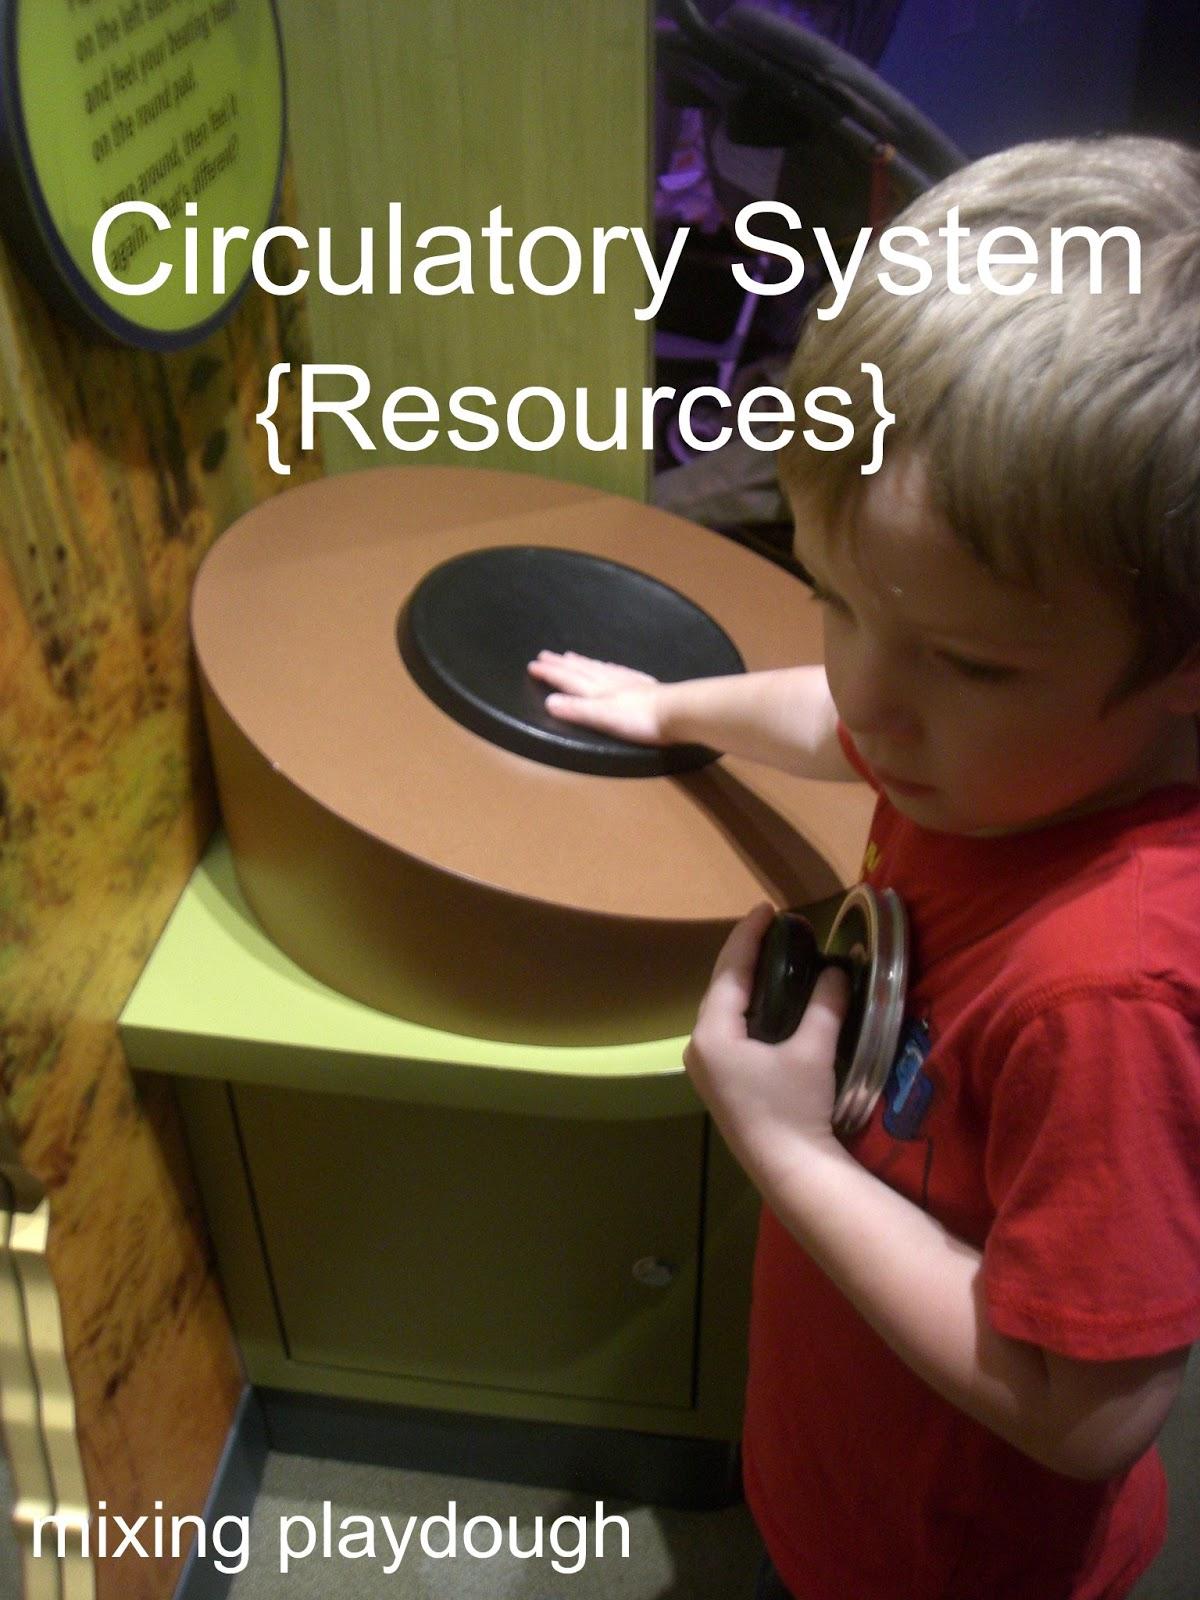 Mixing Playdough Circulatory System Resources Heart